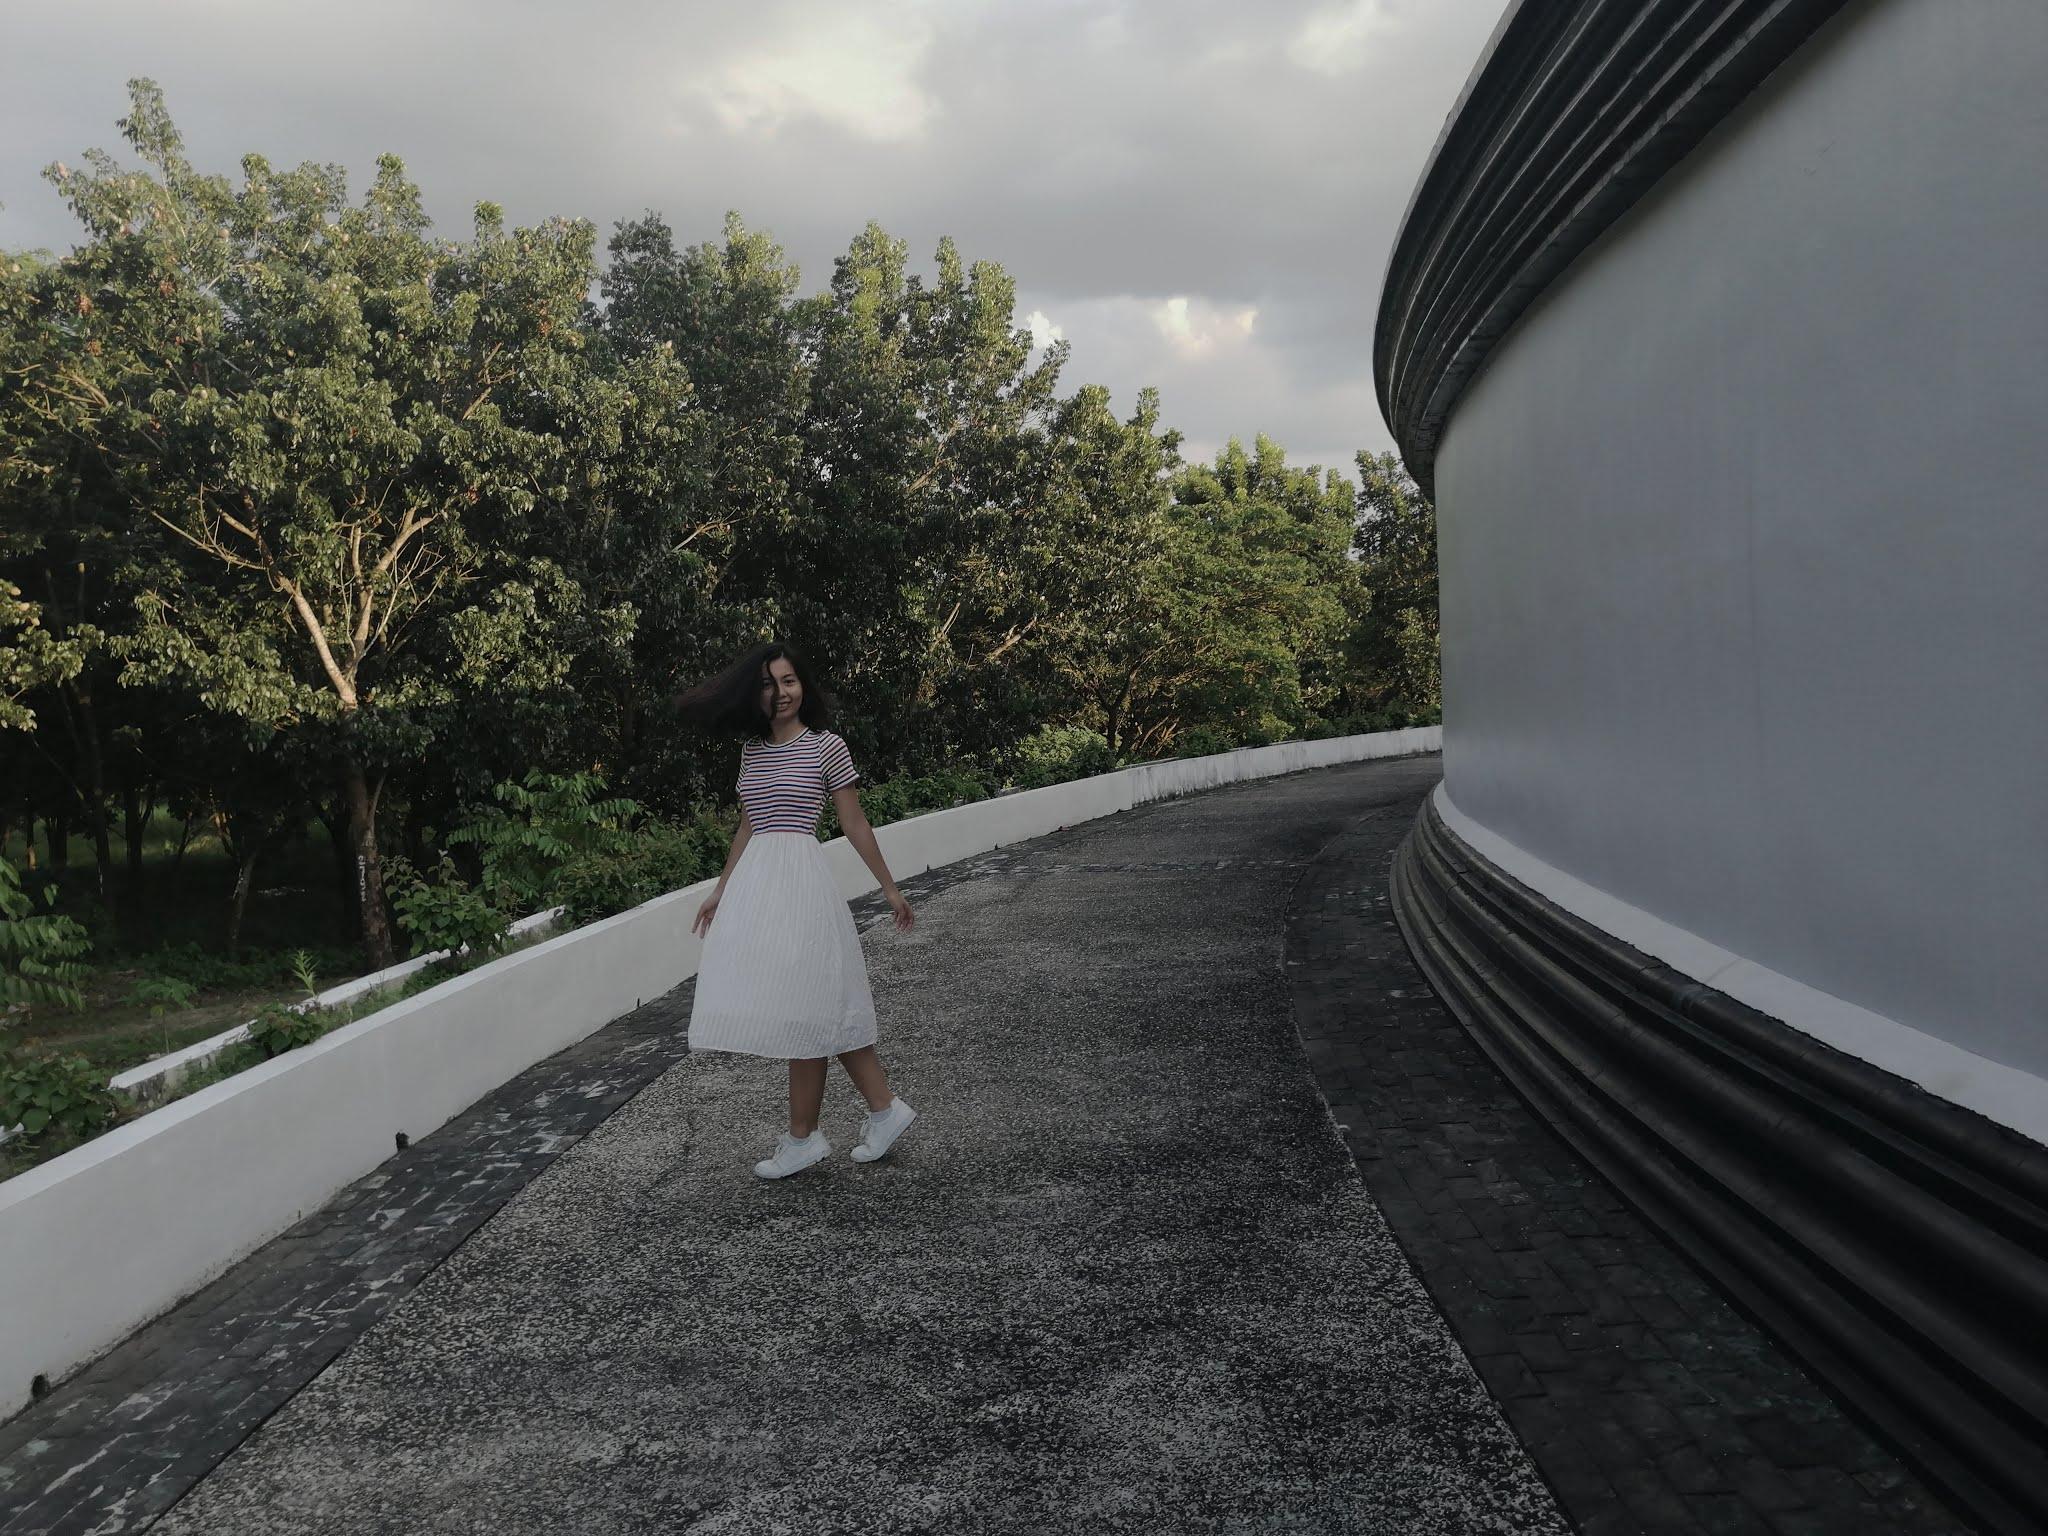 Life blogger Teresa Gueco advice on life